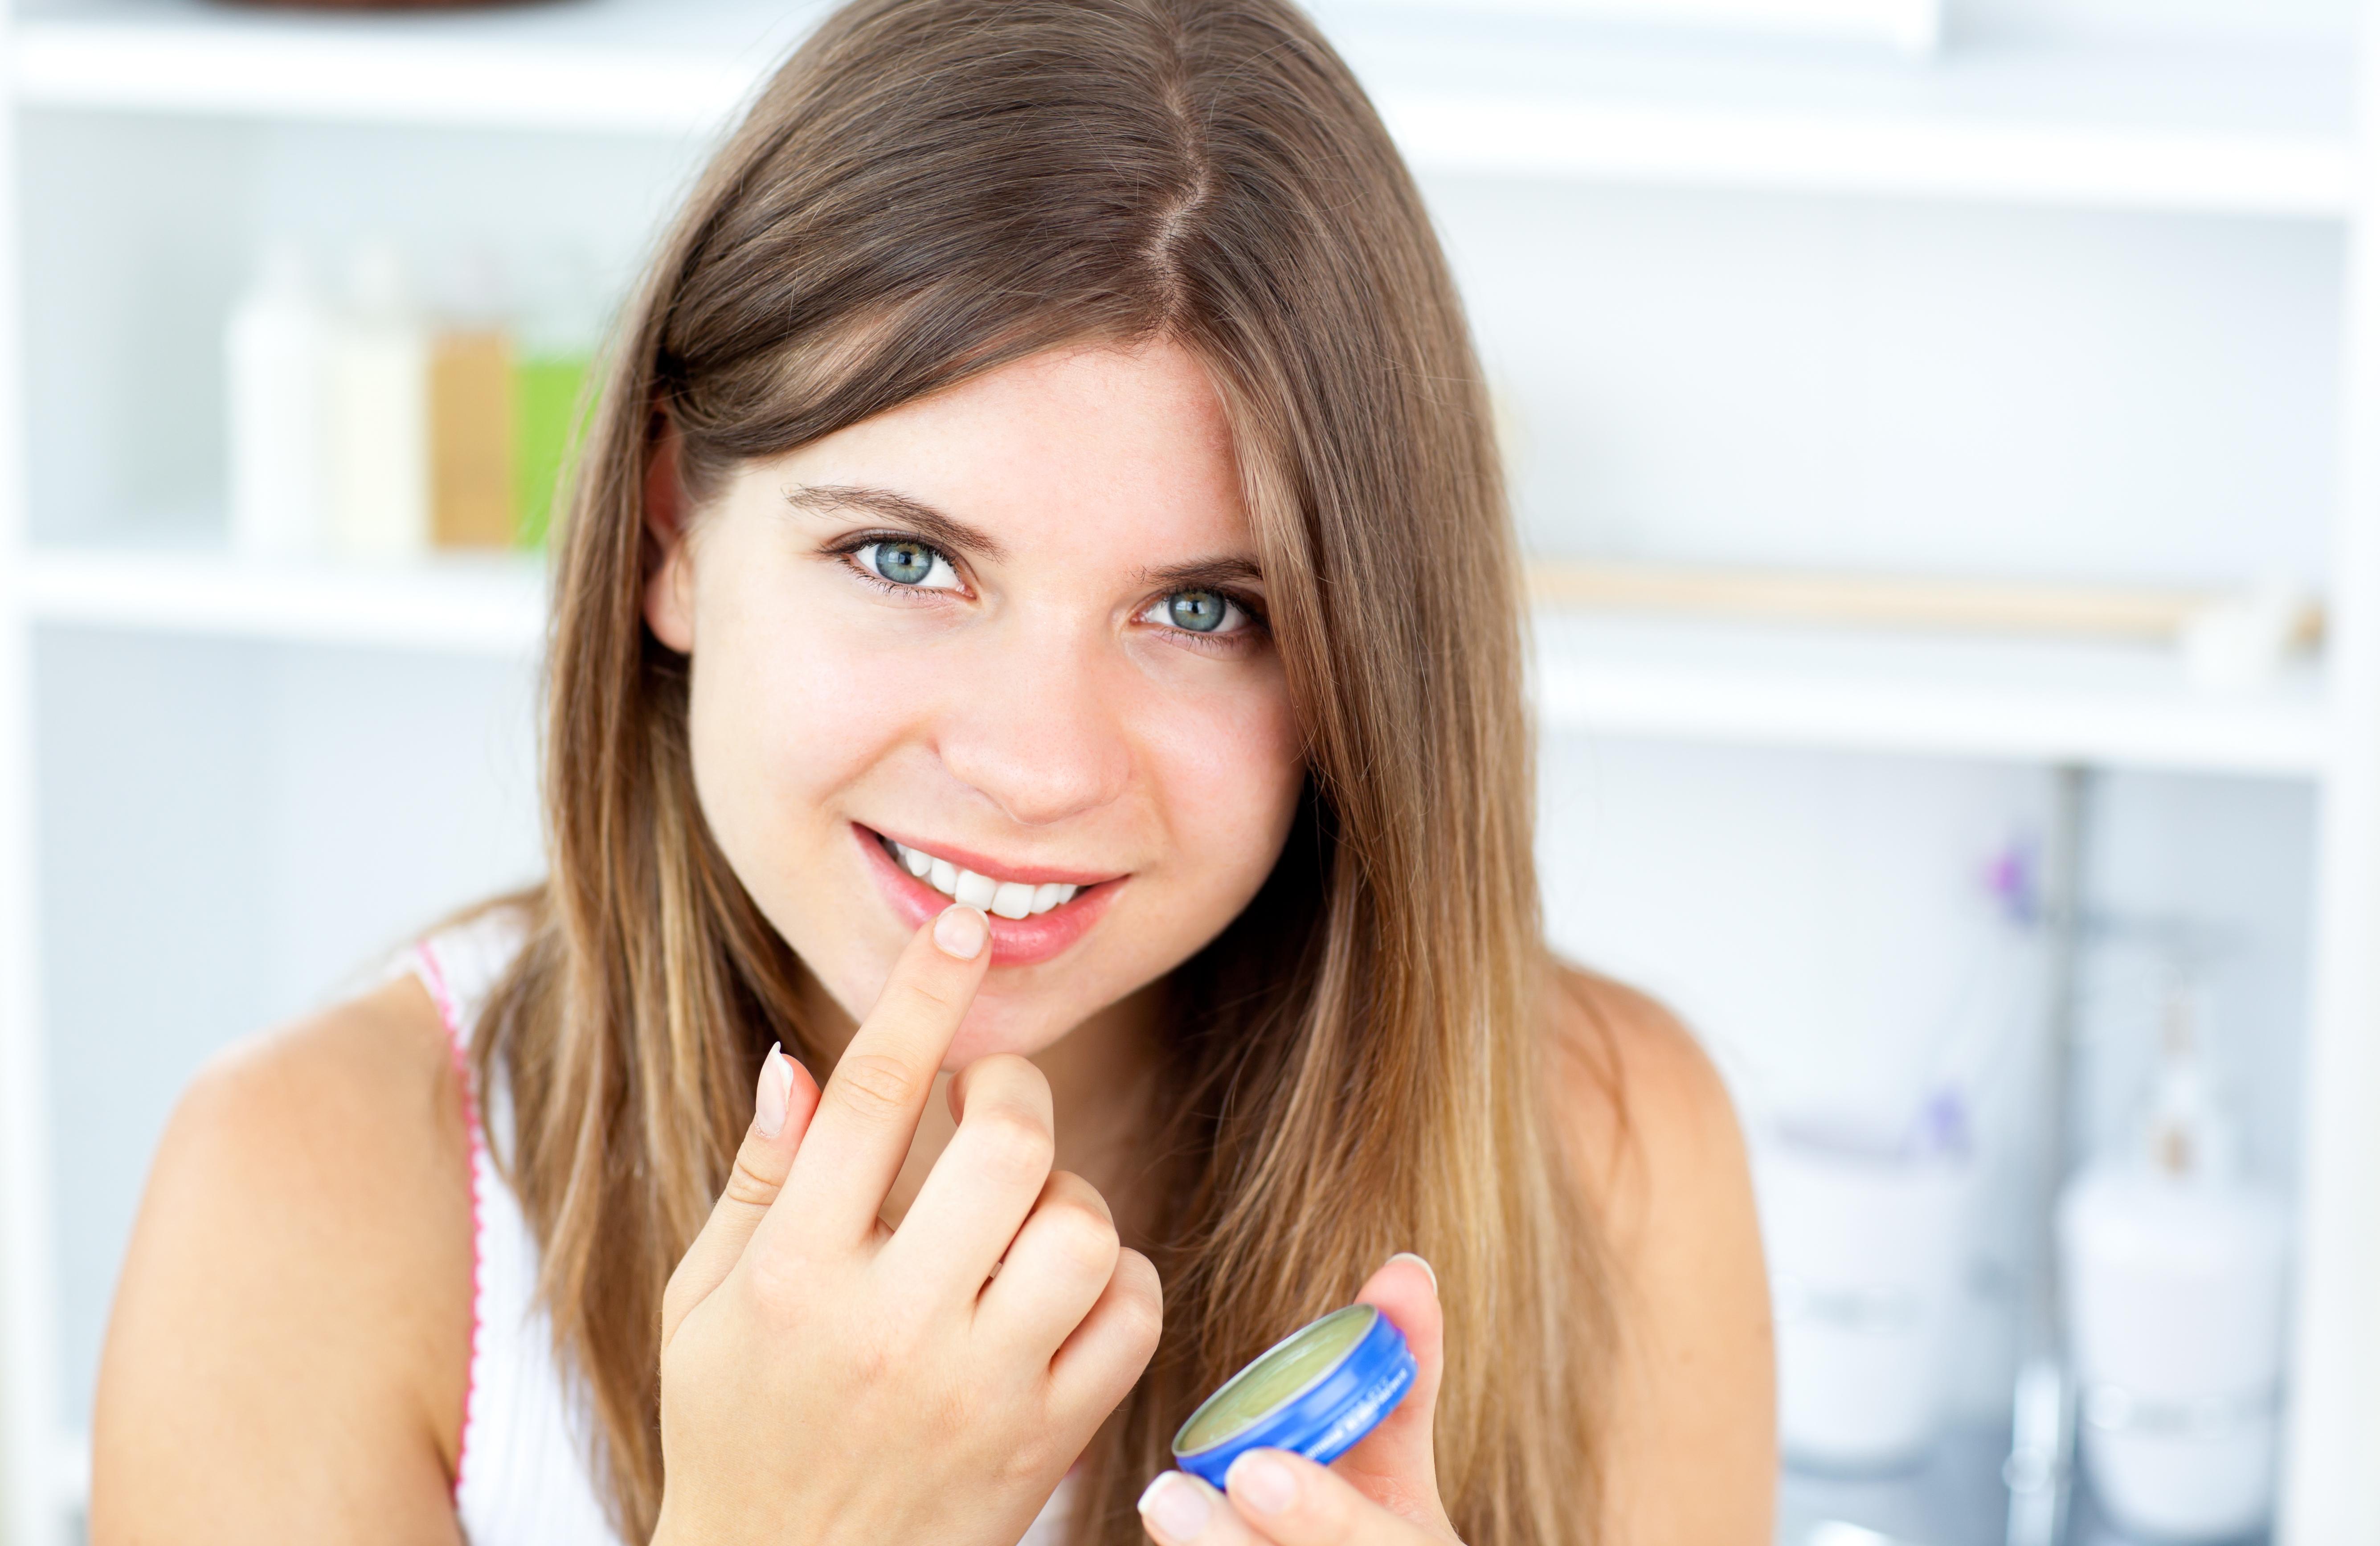 10 Best Uses of Vaseline for Men and Women